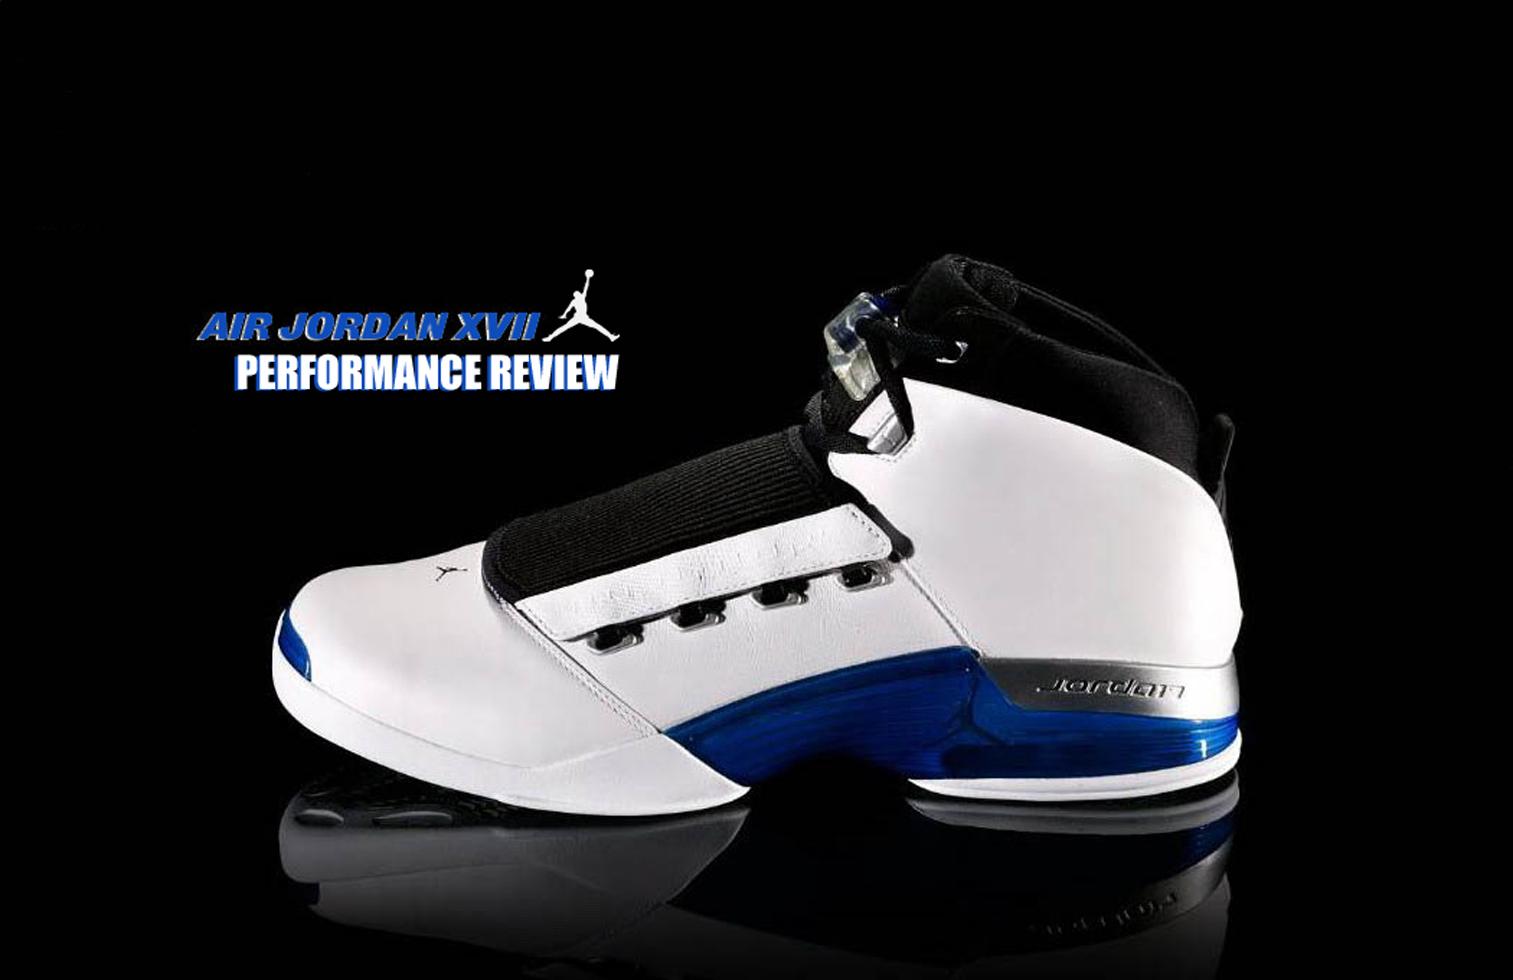 Air Jordan Project – Air Jordan XVII (17) Performance Review